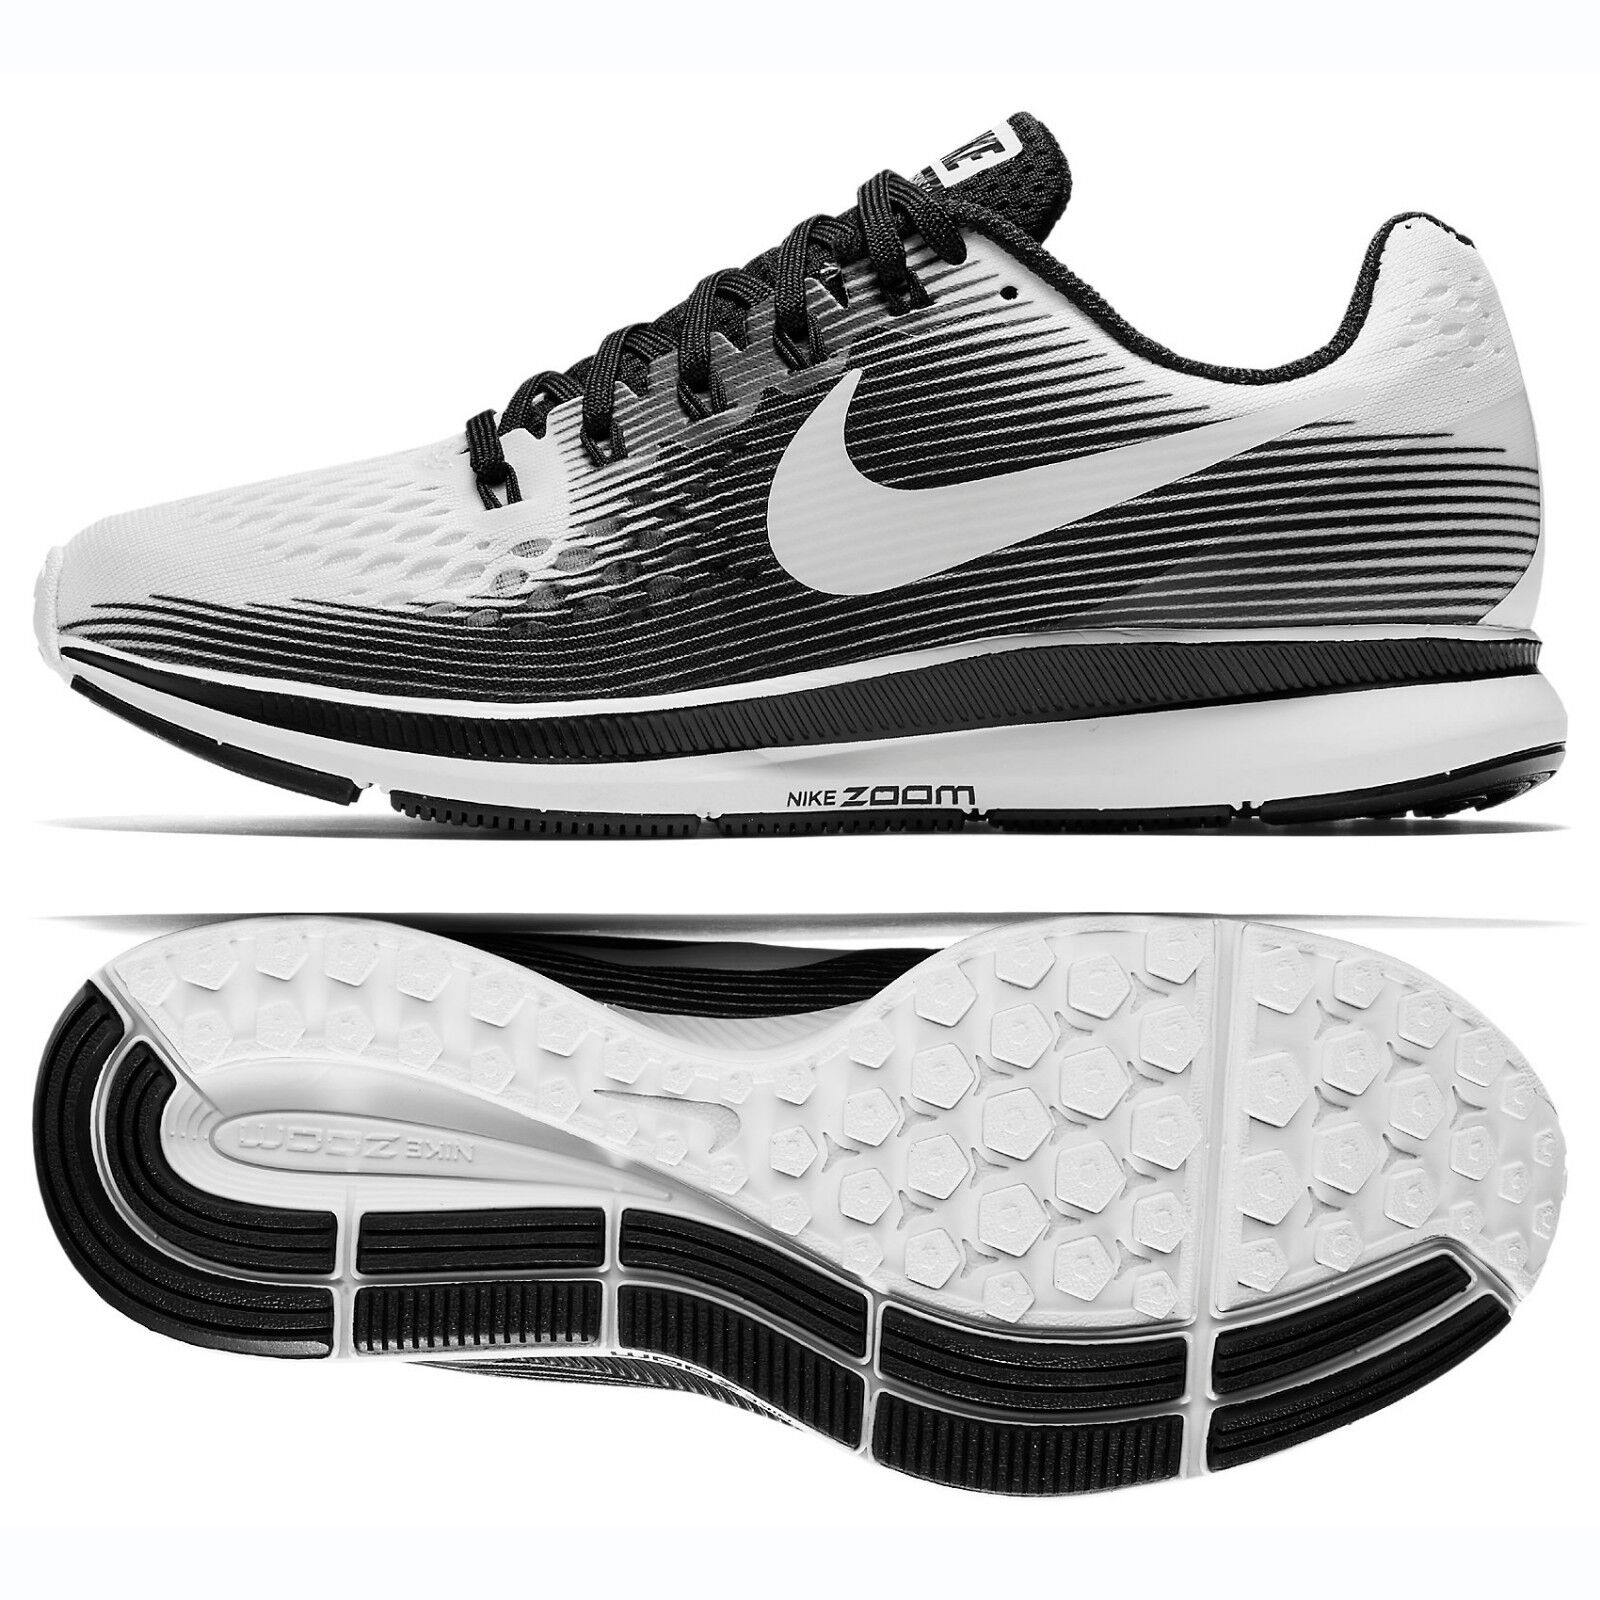 Nike Nike Nike WMNS Air Zoom Pegasus 34 LE 883269-100 bianca nero Donna  Running scarpe 23fc13